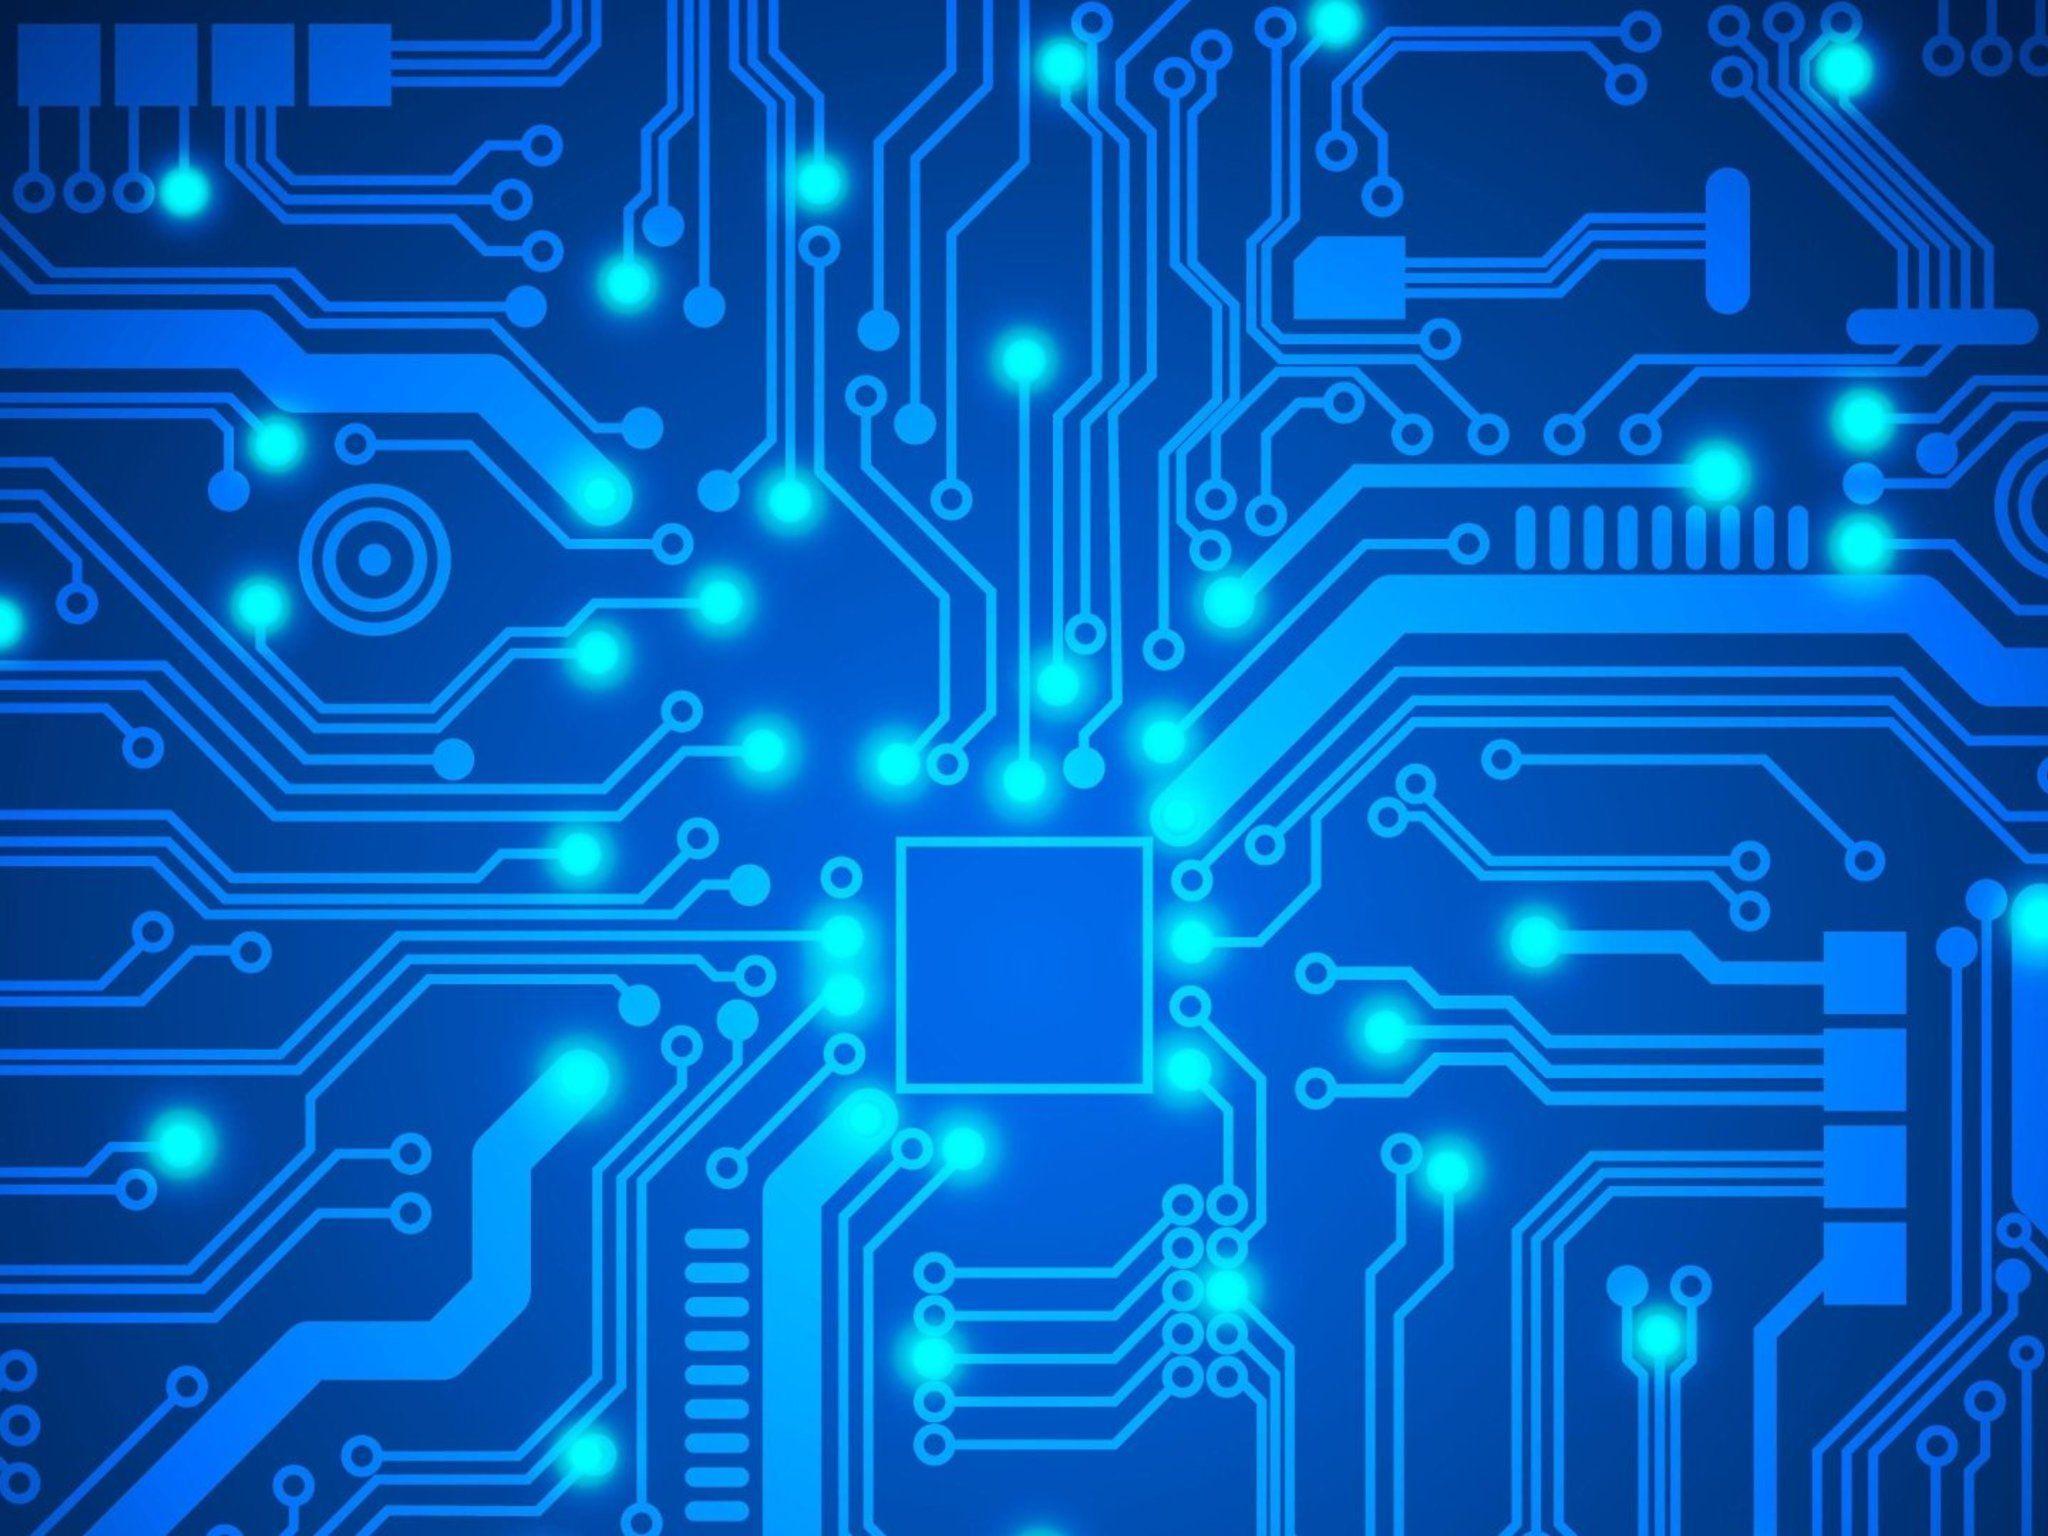 Electrical Engineering Wallpapers